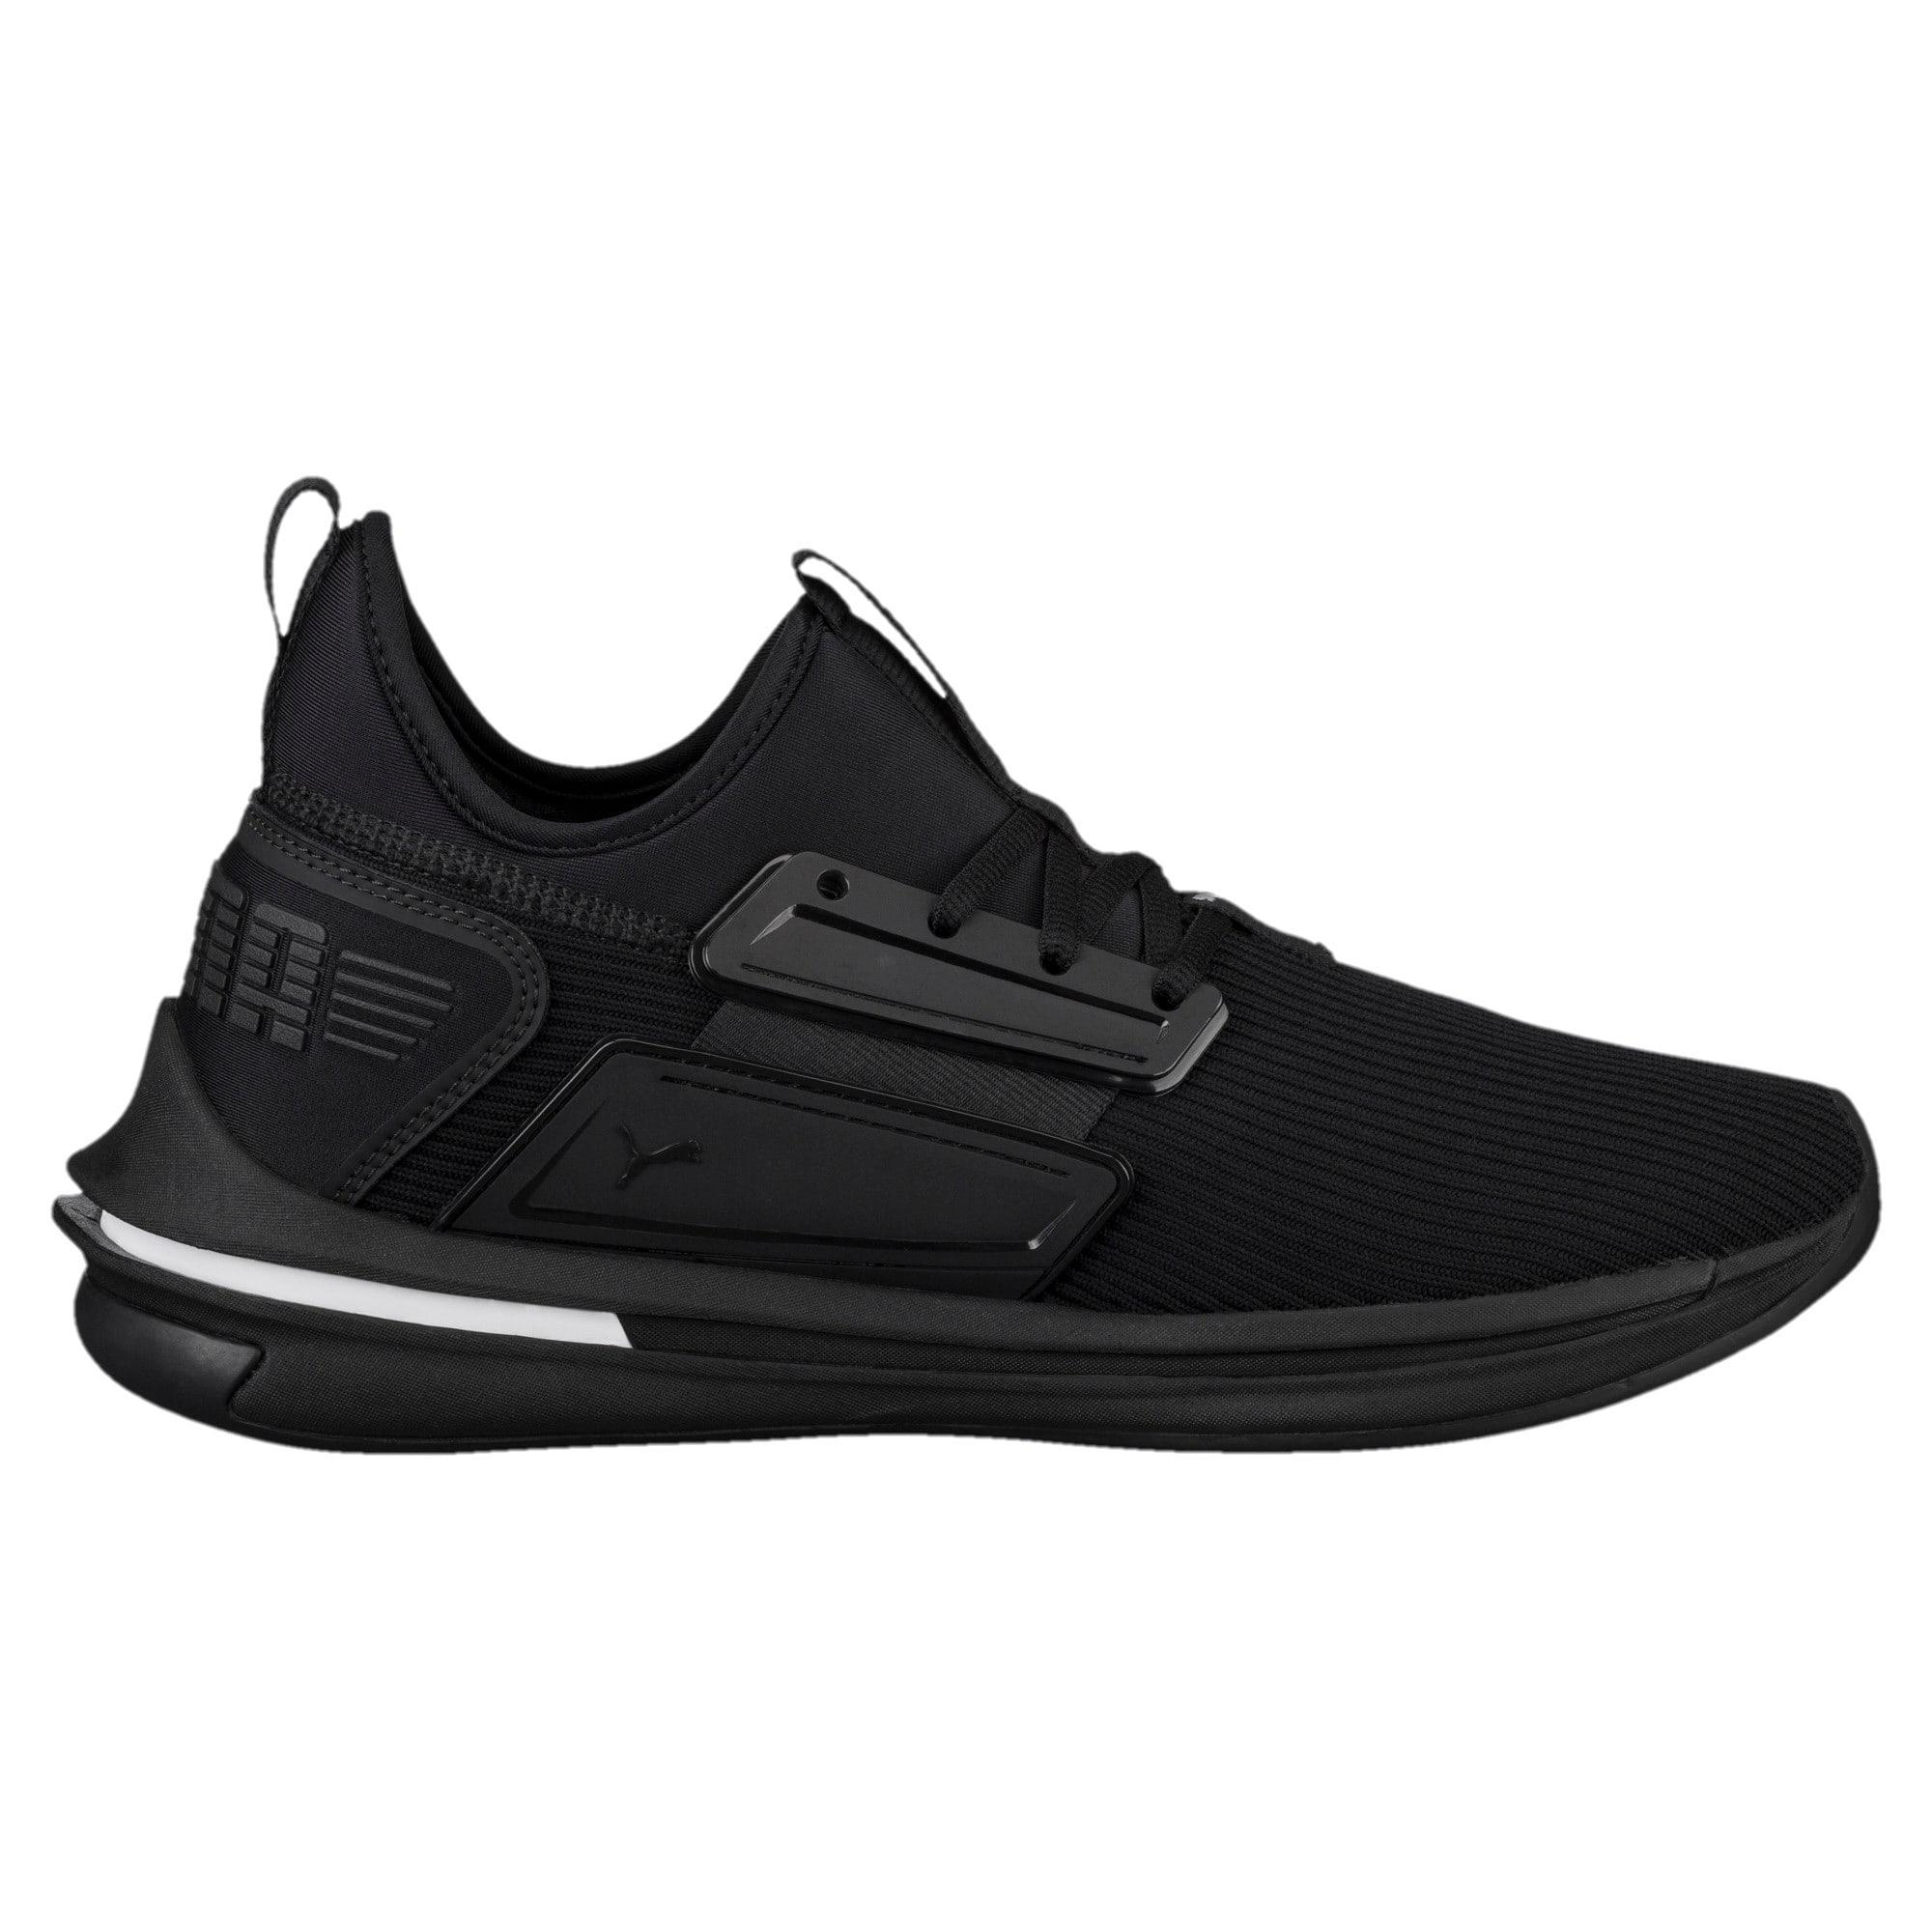 Thumbnail 3 of IGNITE Limitless SR Men's Running Shoes, Puma Black, medium-IND